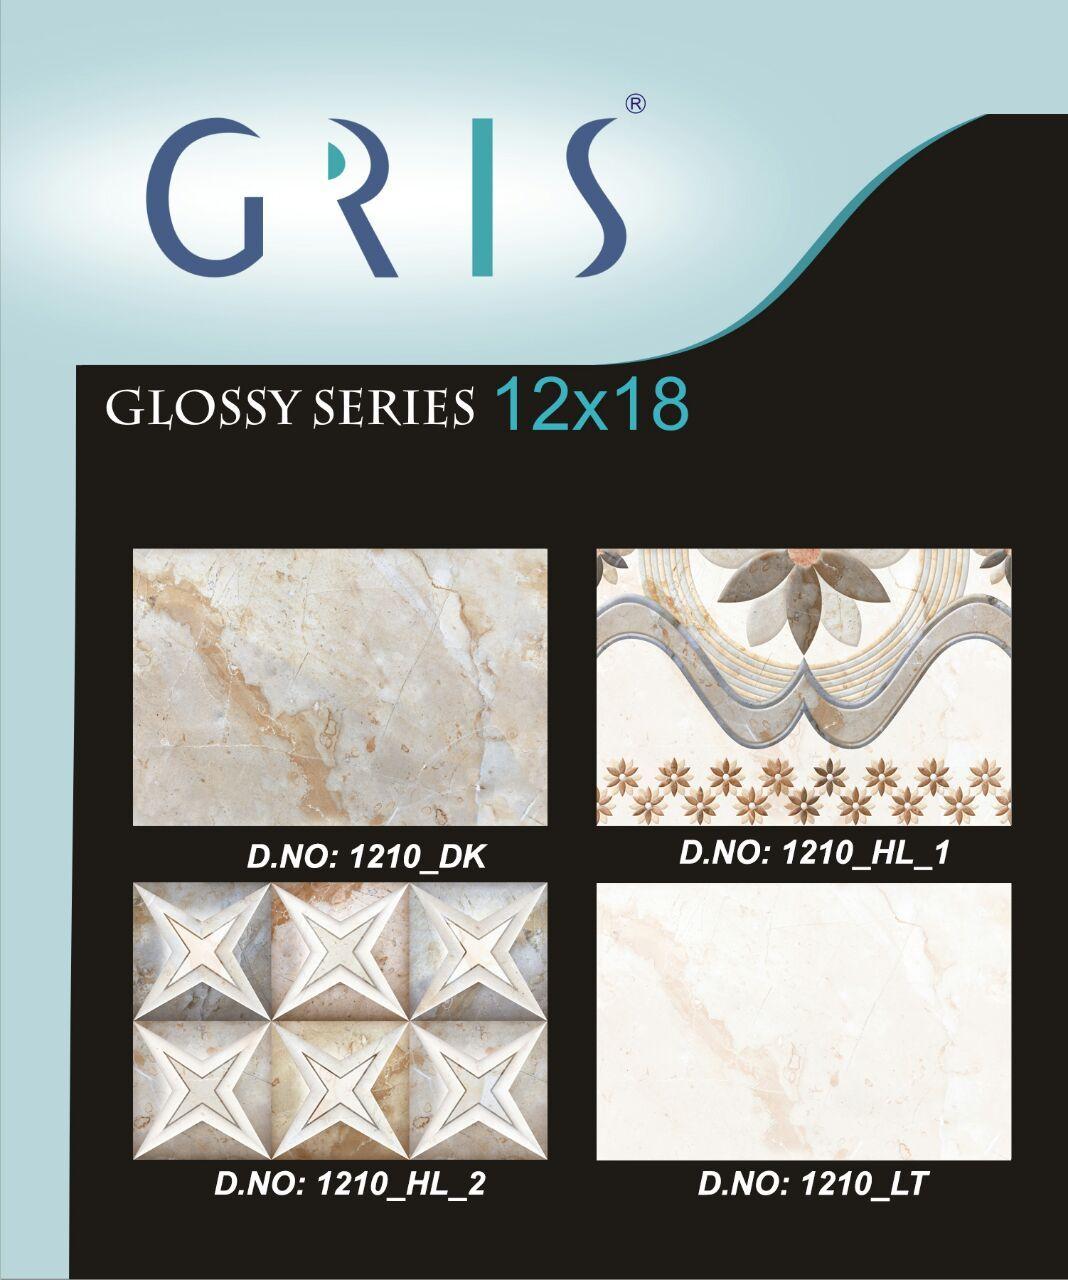 Get access to various Digital Wall Tiles & Glazed tiles More Details : https://goo.gl/K1PTlL